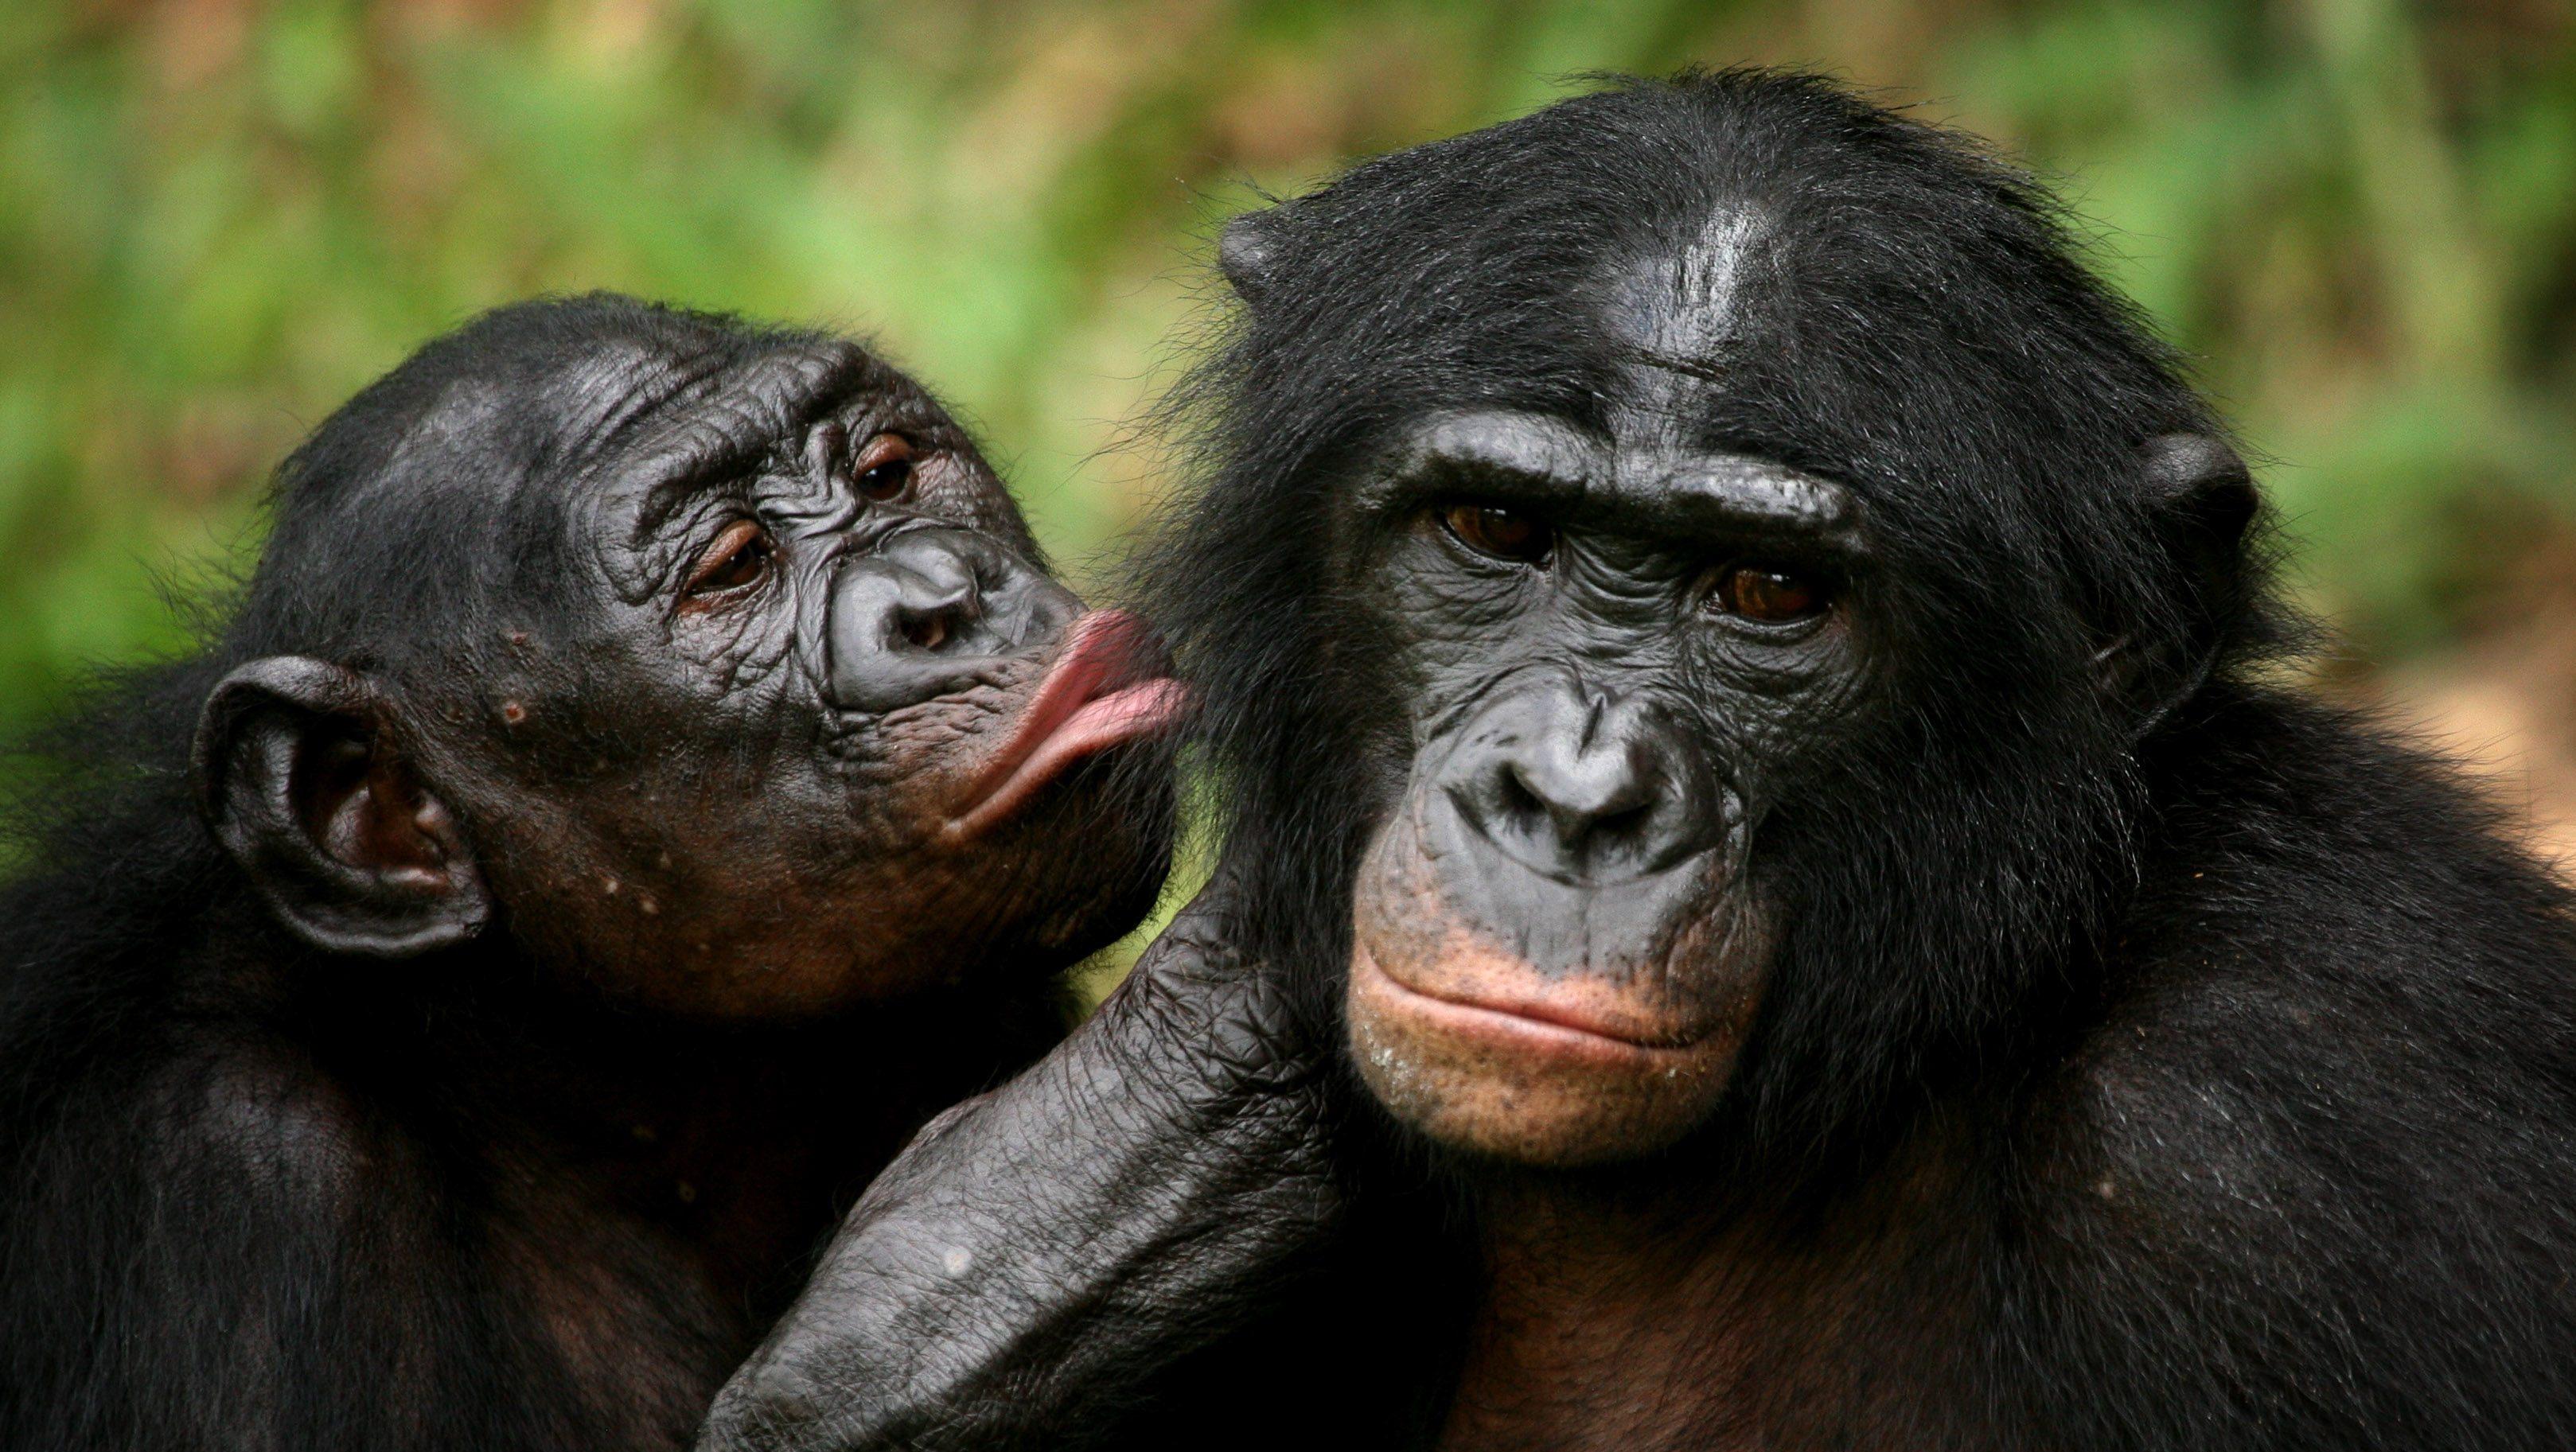 Free Ape Sex Videos apes like mean people — quartz